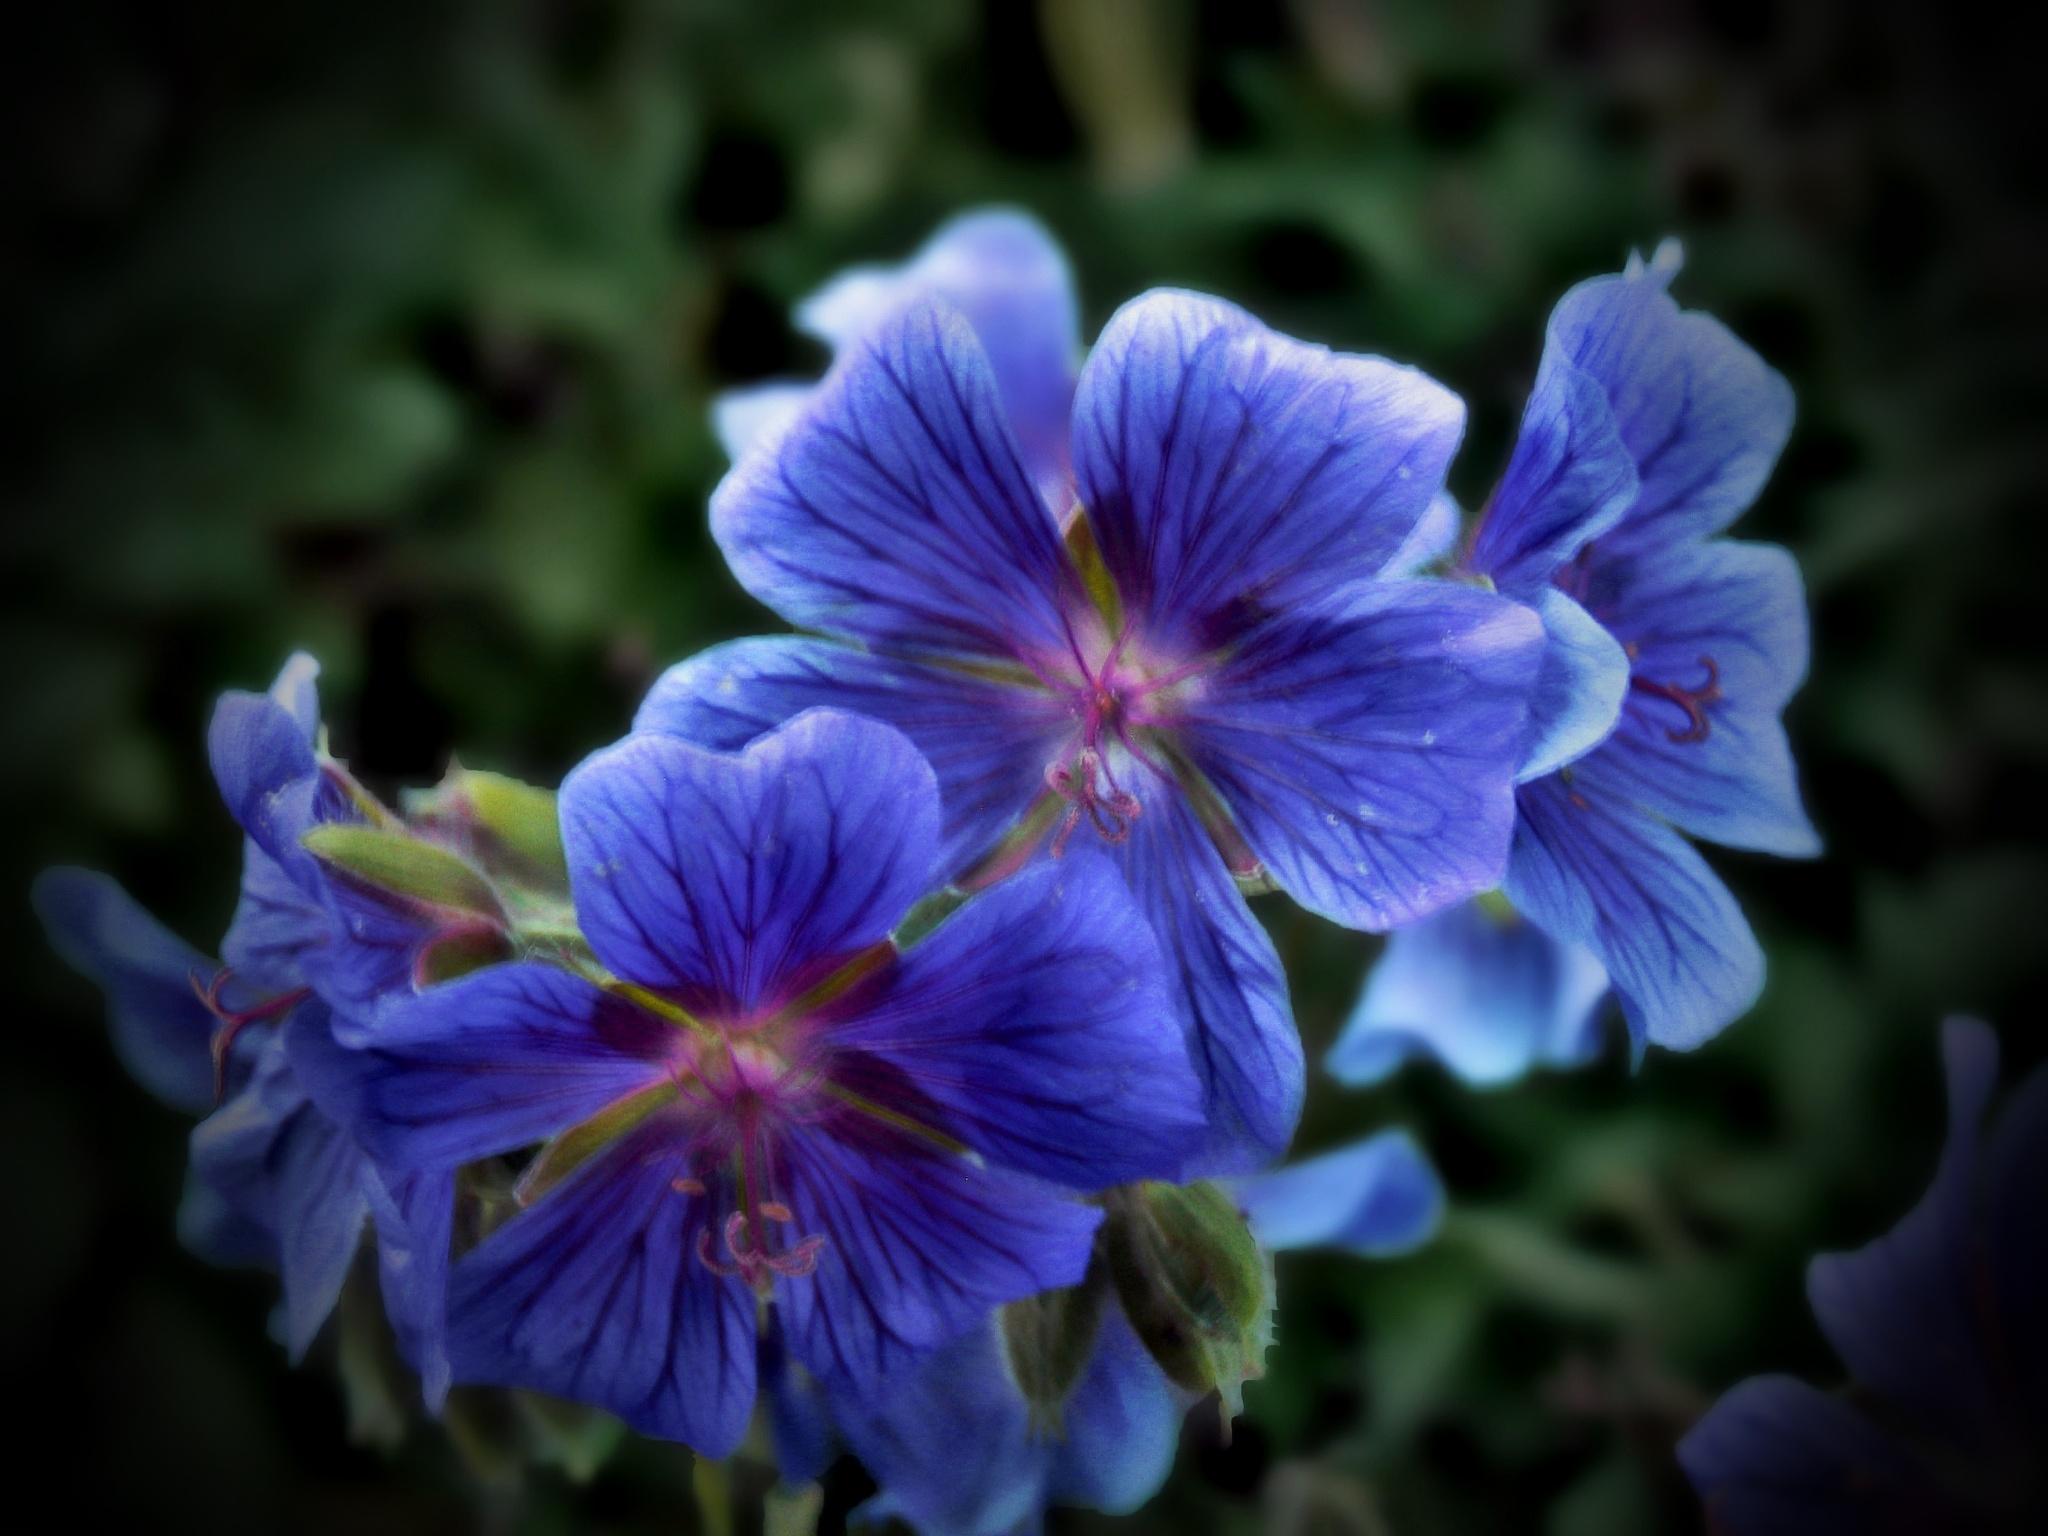 Geranium Blooms by monarch